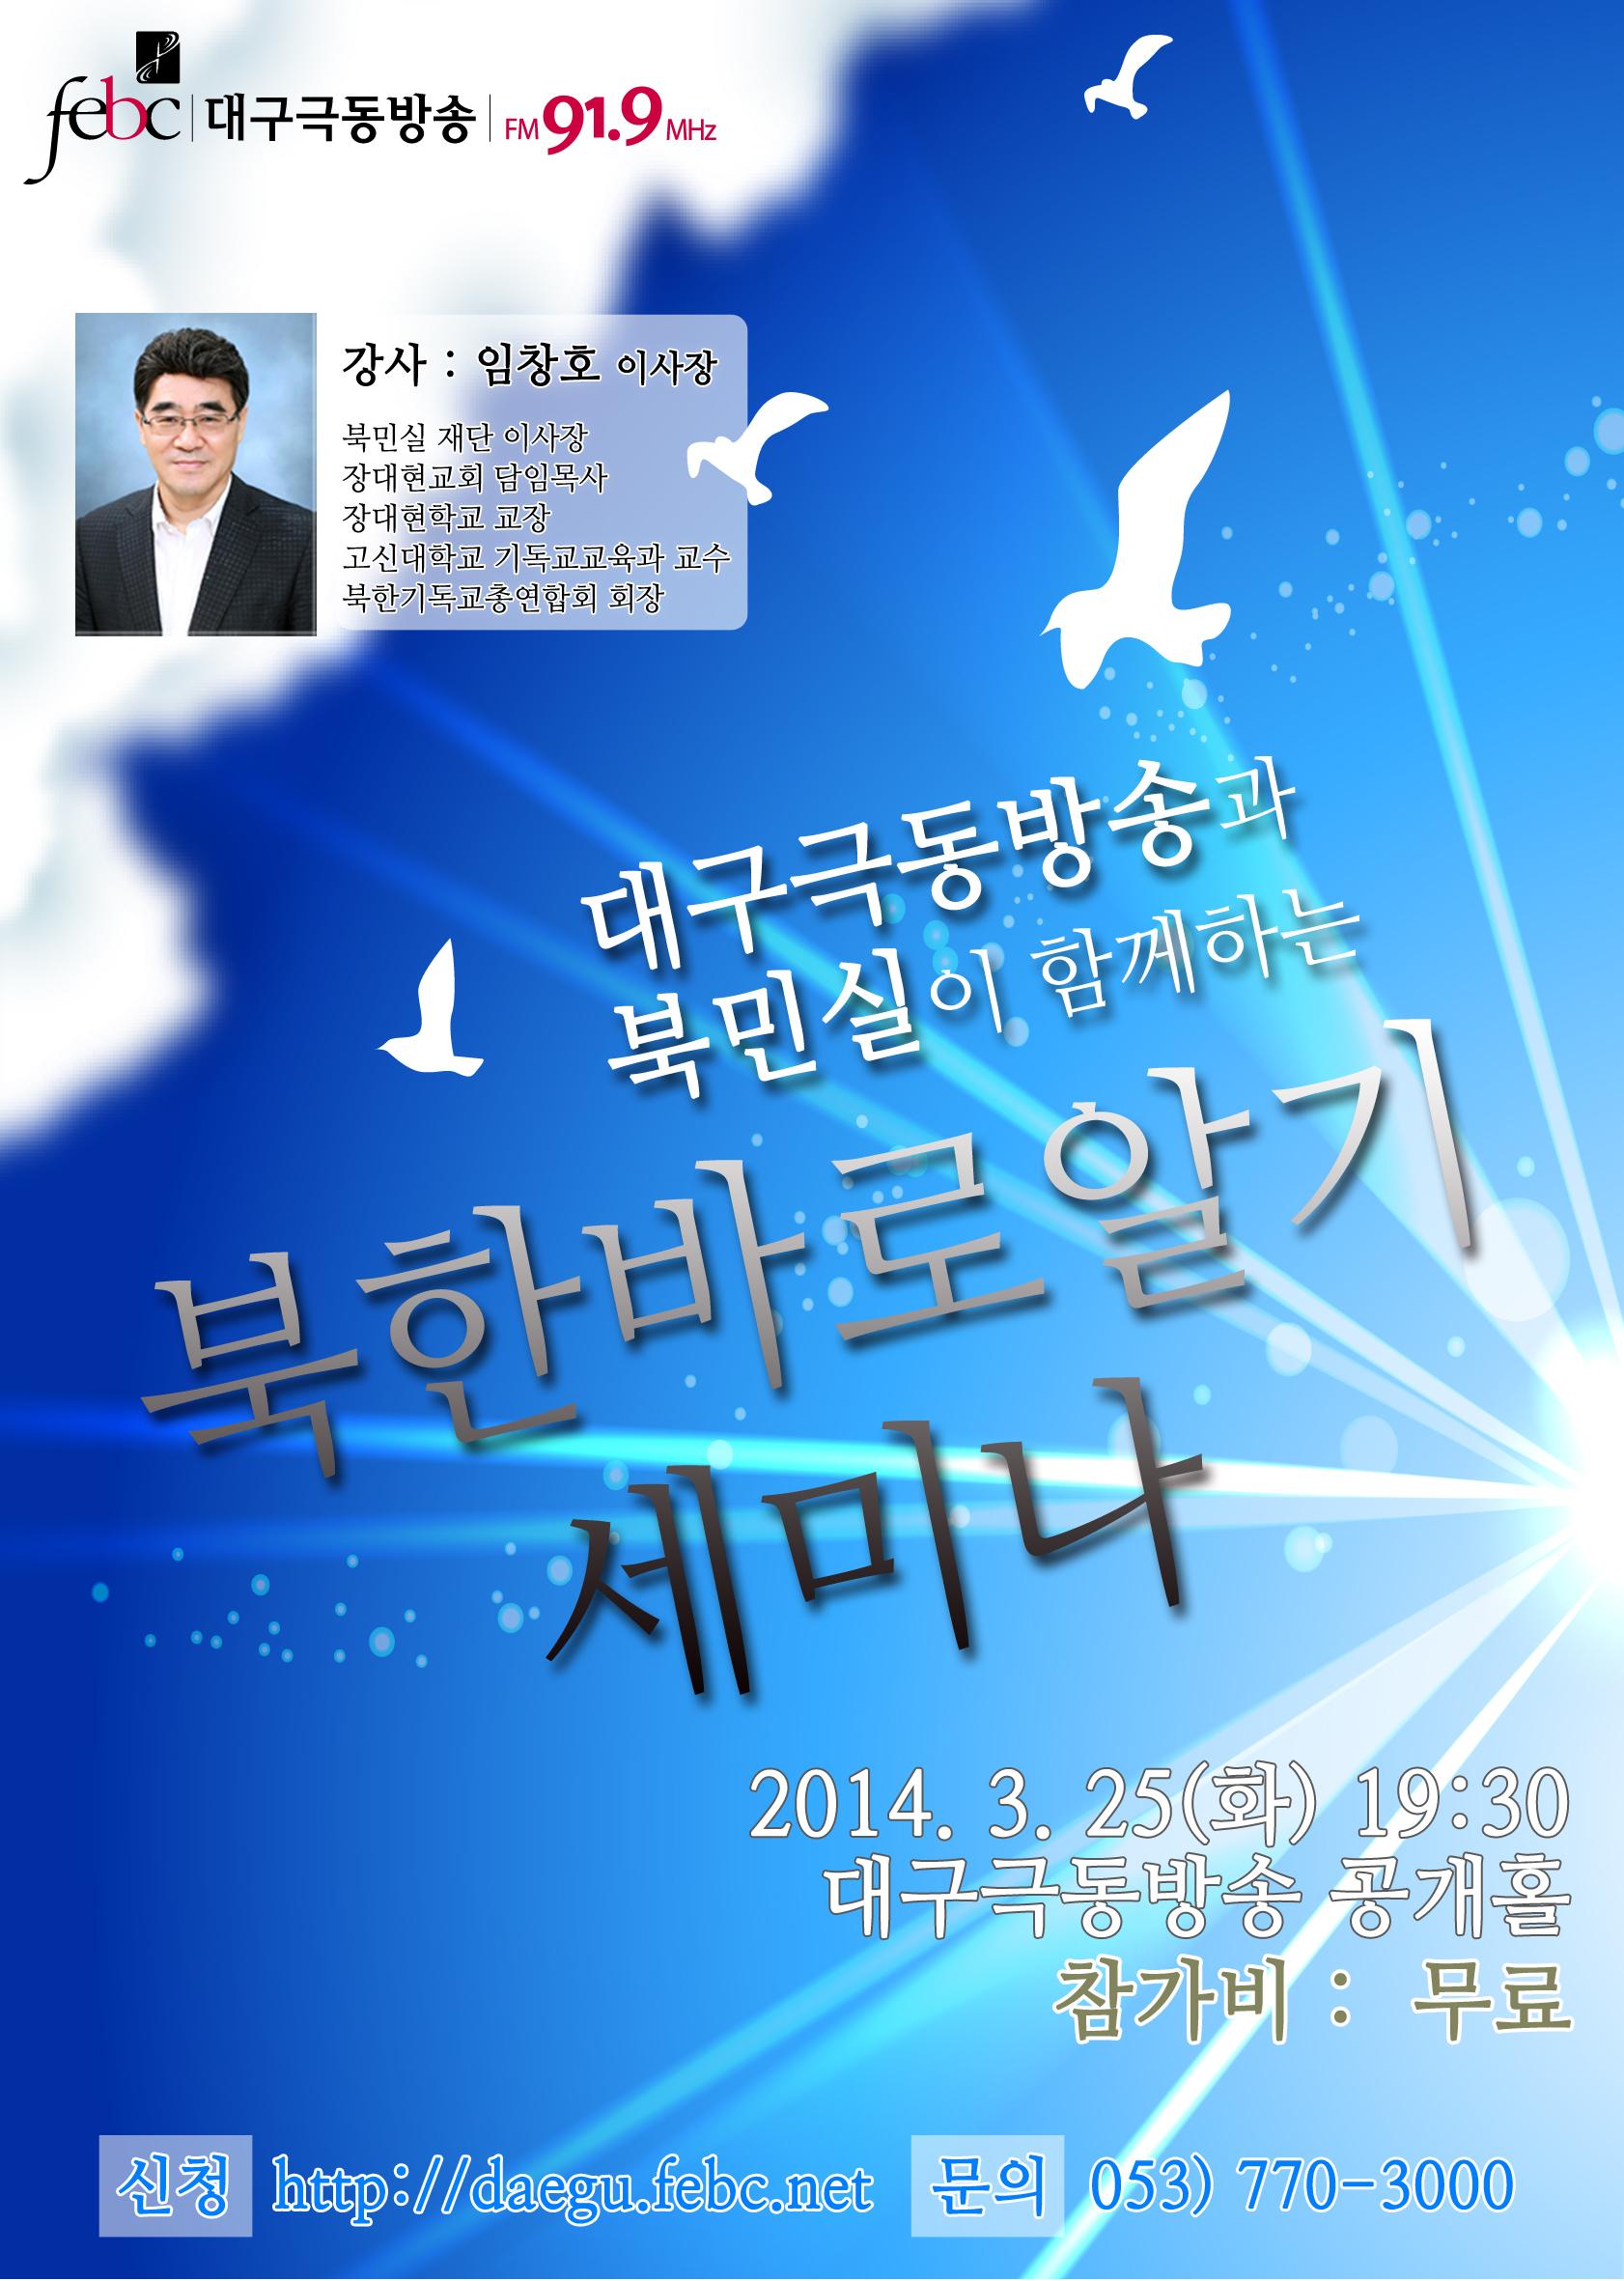 [Ver.6] 북한바로알기 세미나 팝업 이미지.jpg